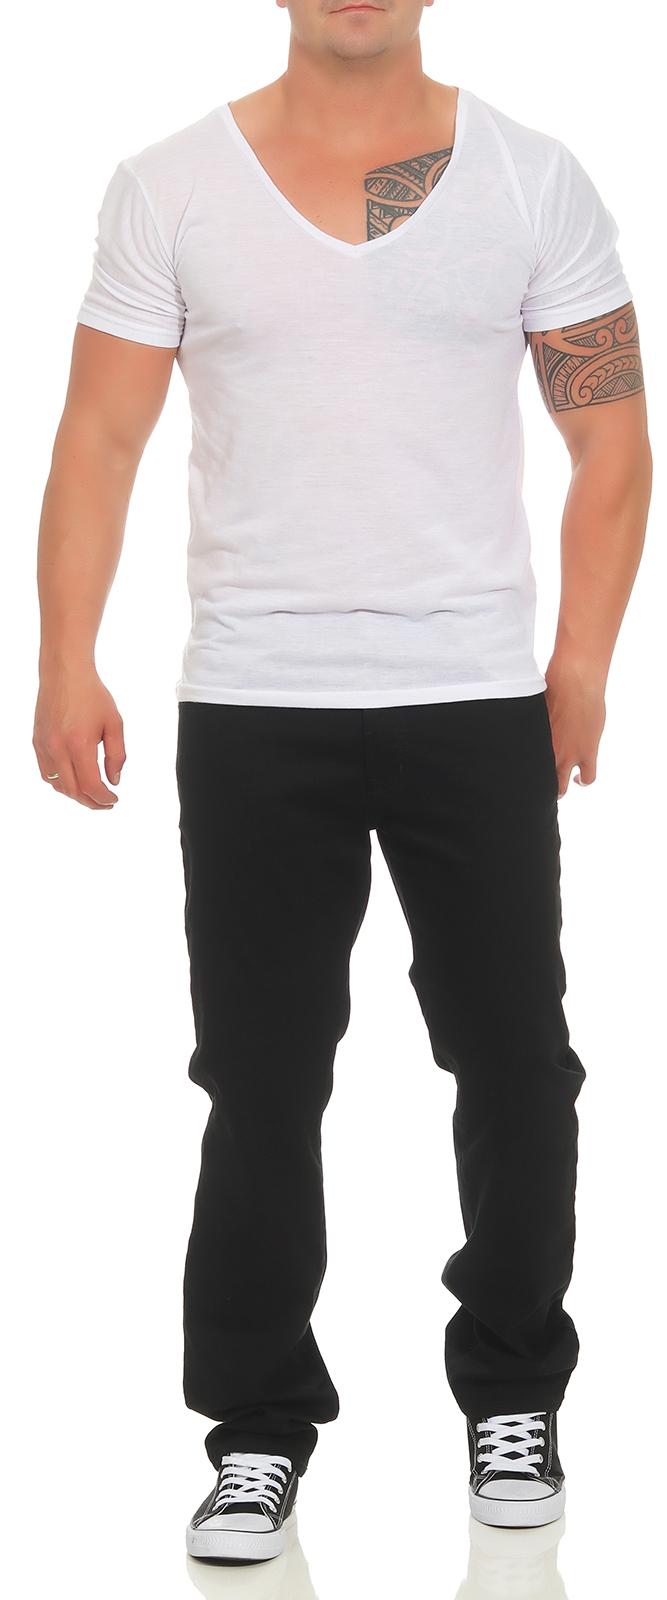 PIERRE-CARDIN-Herren-Jeans-Dijon-Hose-Comfort-Stretch-Freizeitjeans-Modern-NEU-3 Indexbild 13